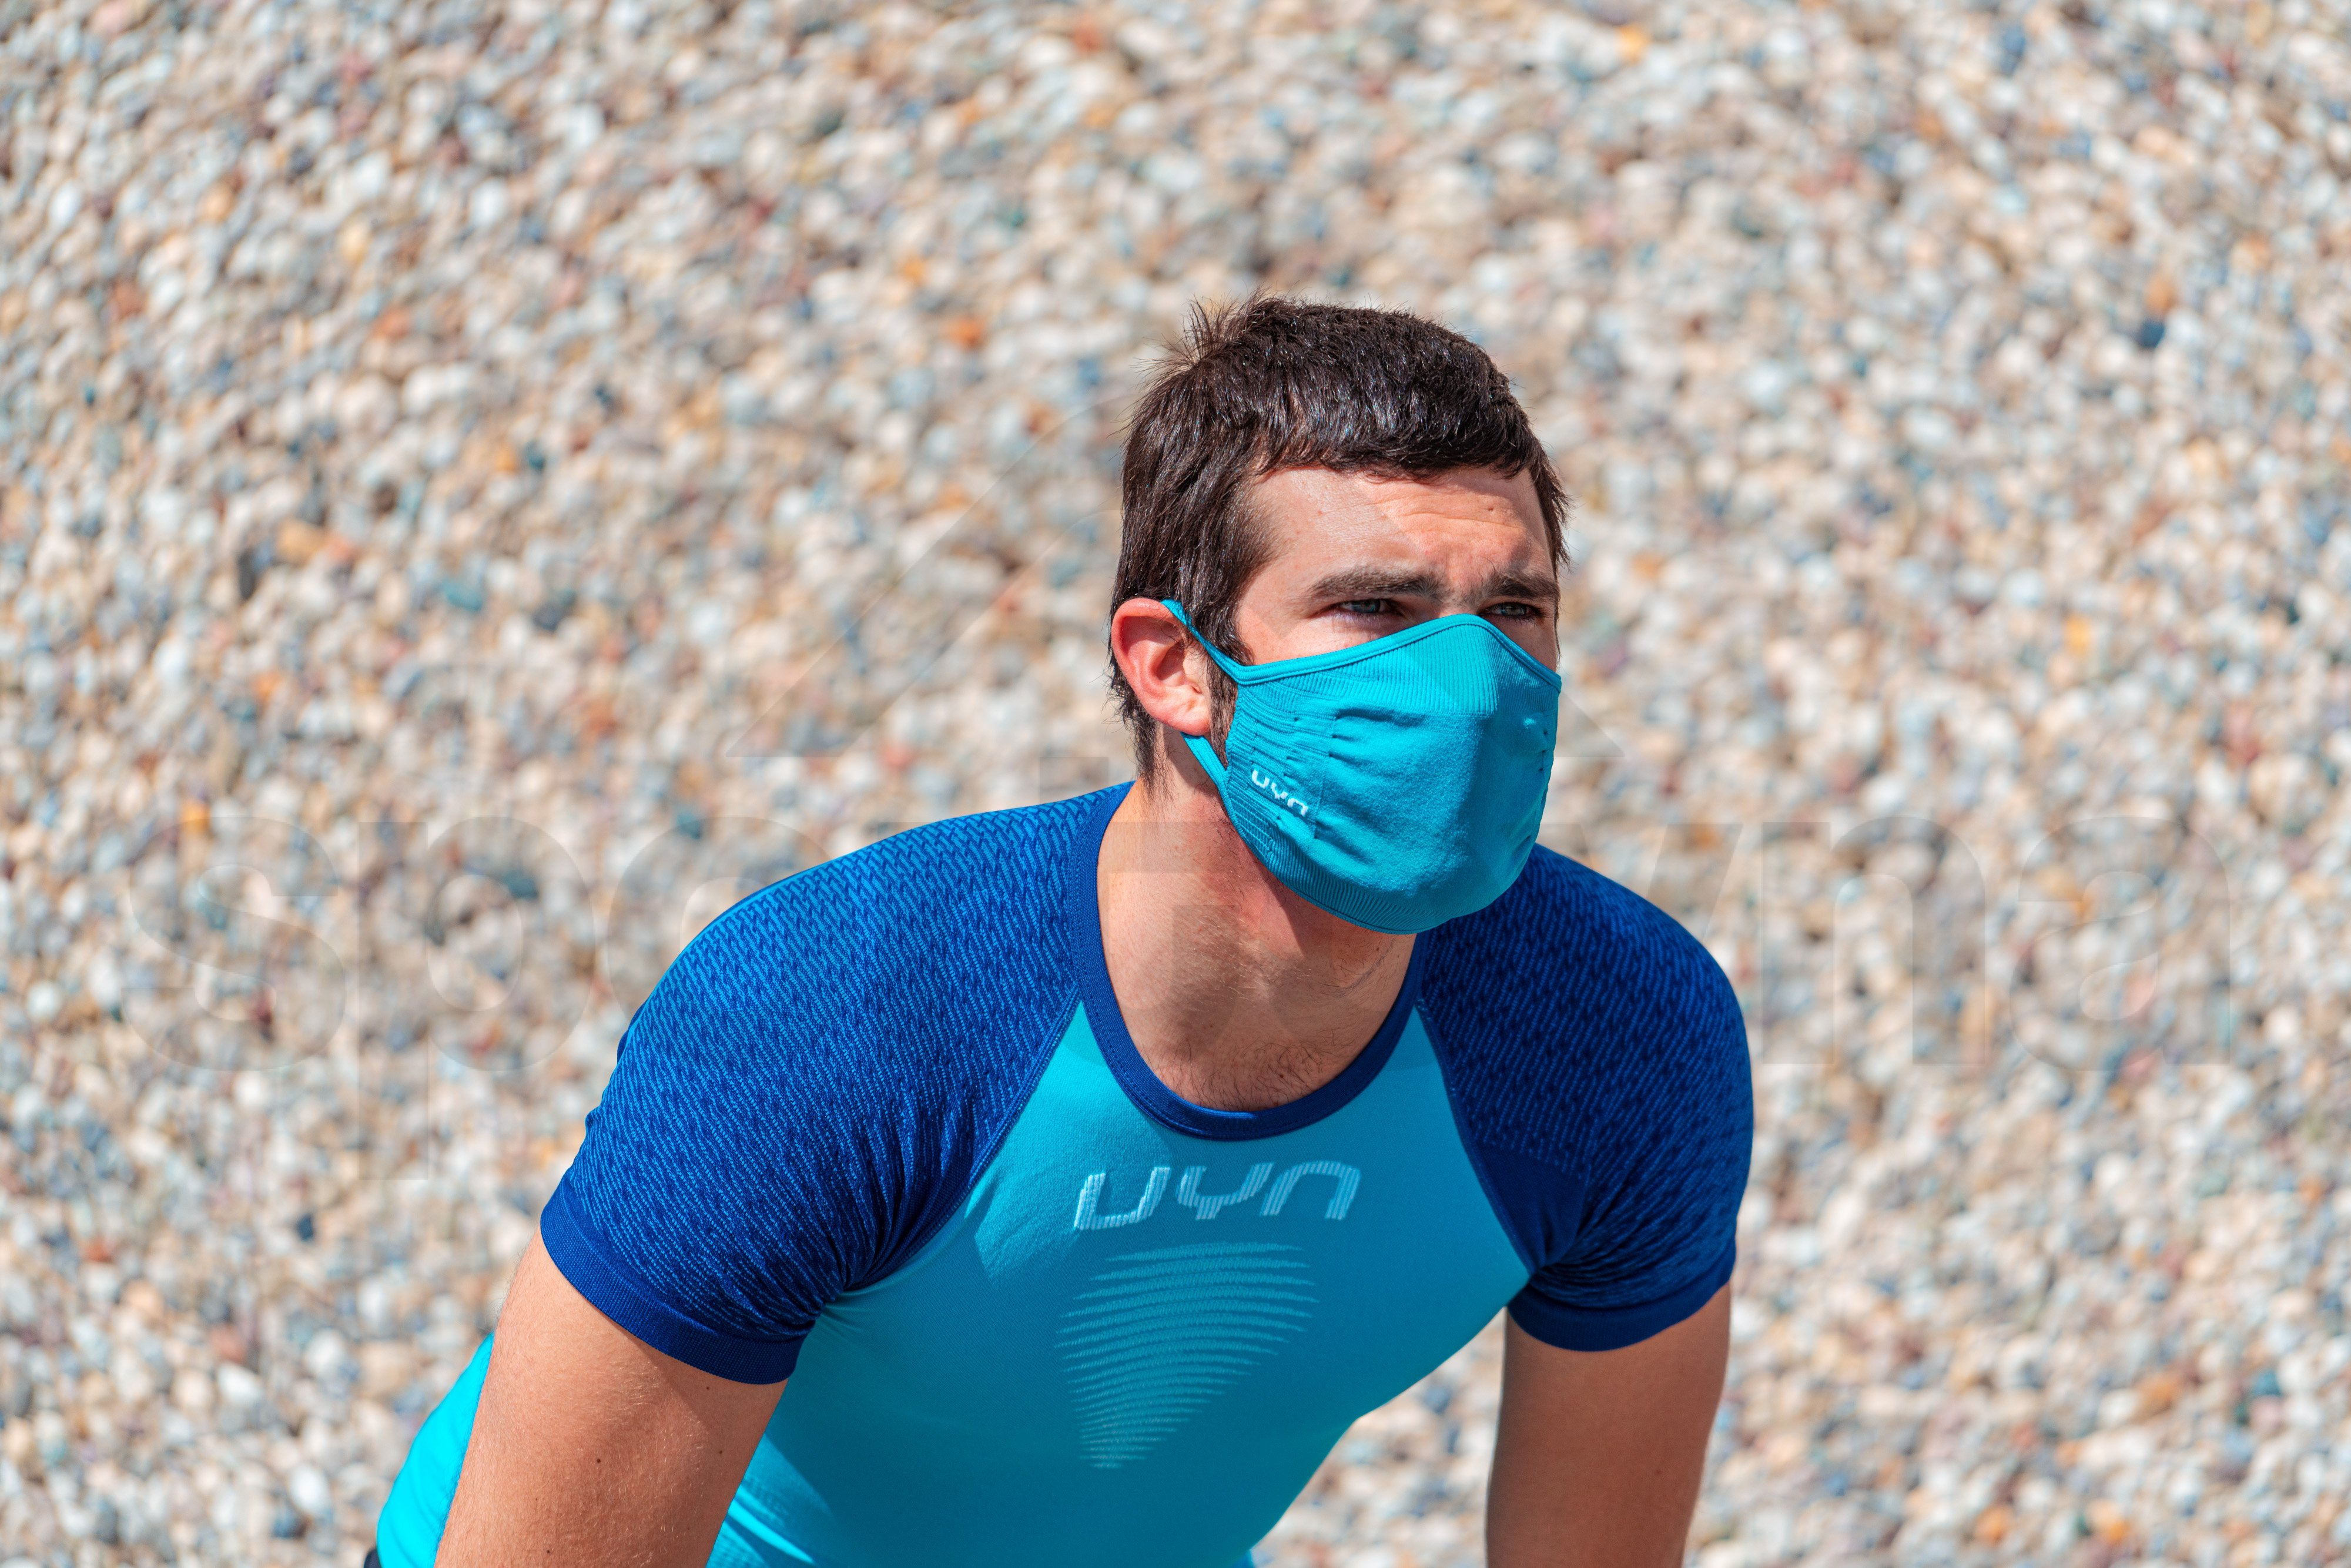 Rouška UYN Community Mask - tmavě modrá